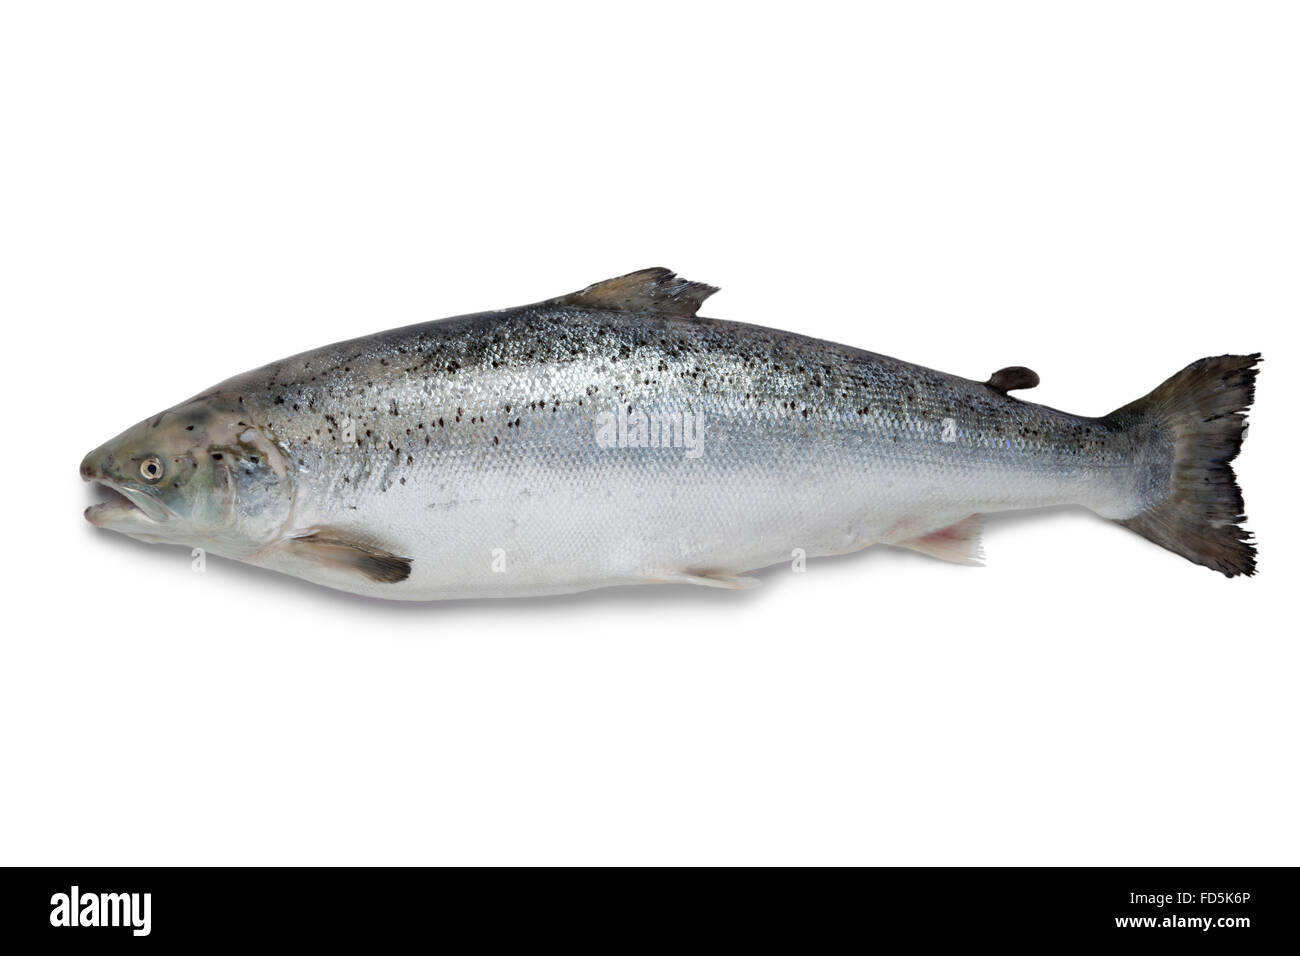 Fresh raw salmon fish on white background - Stock Image